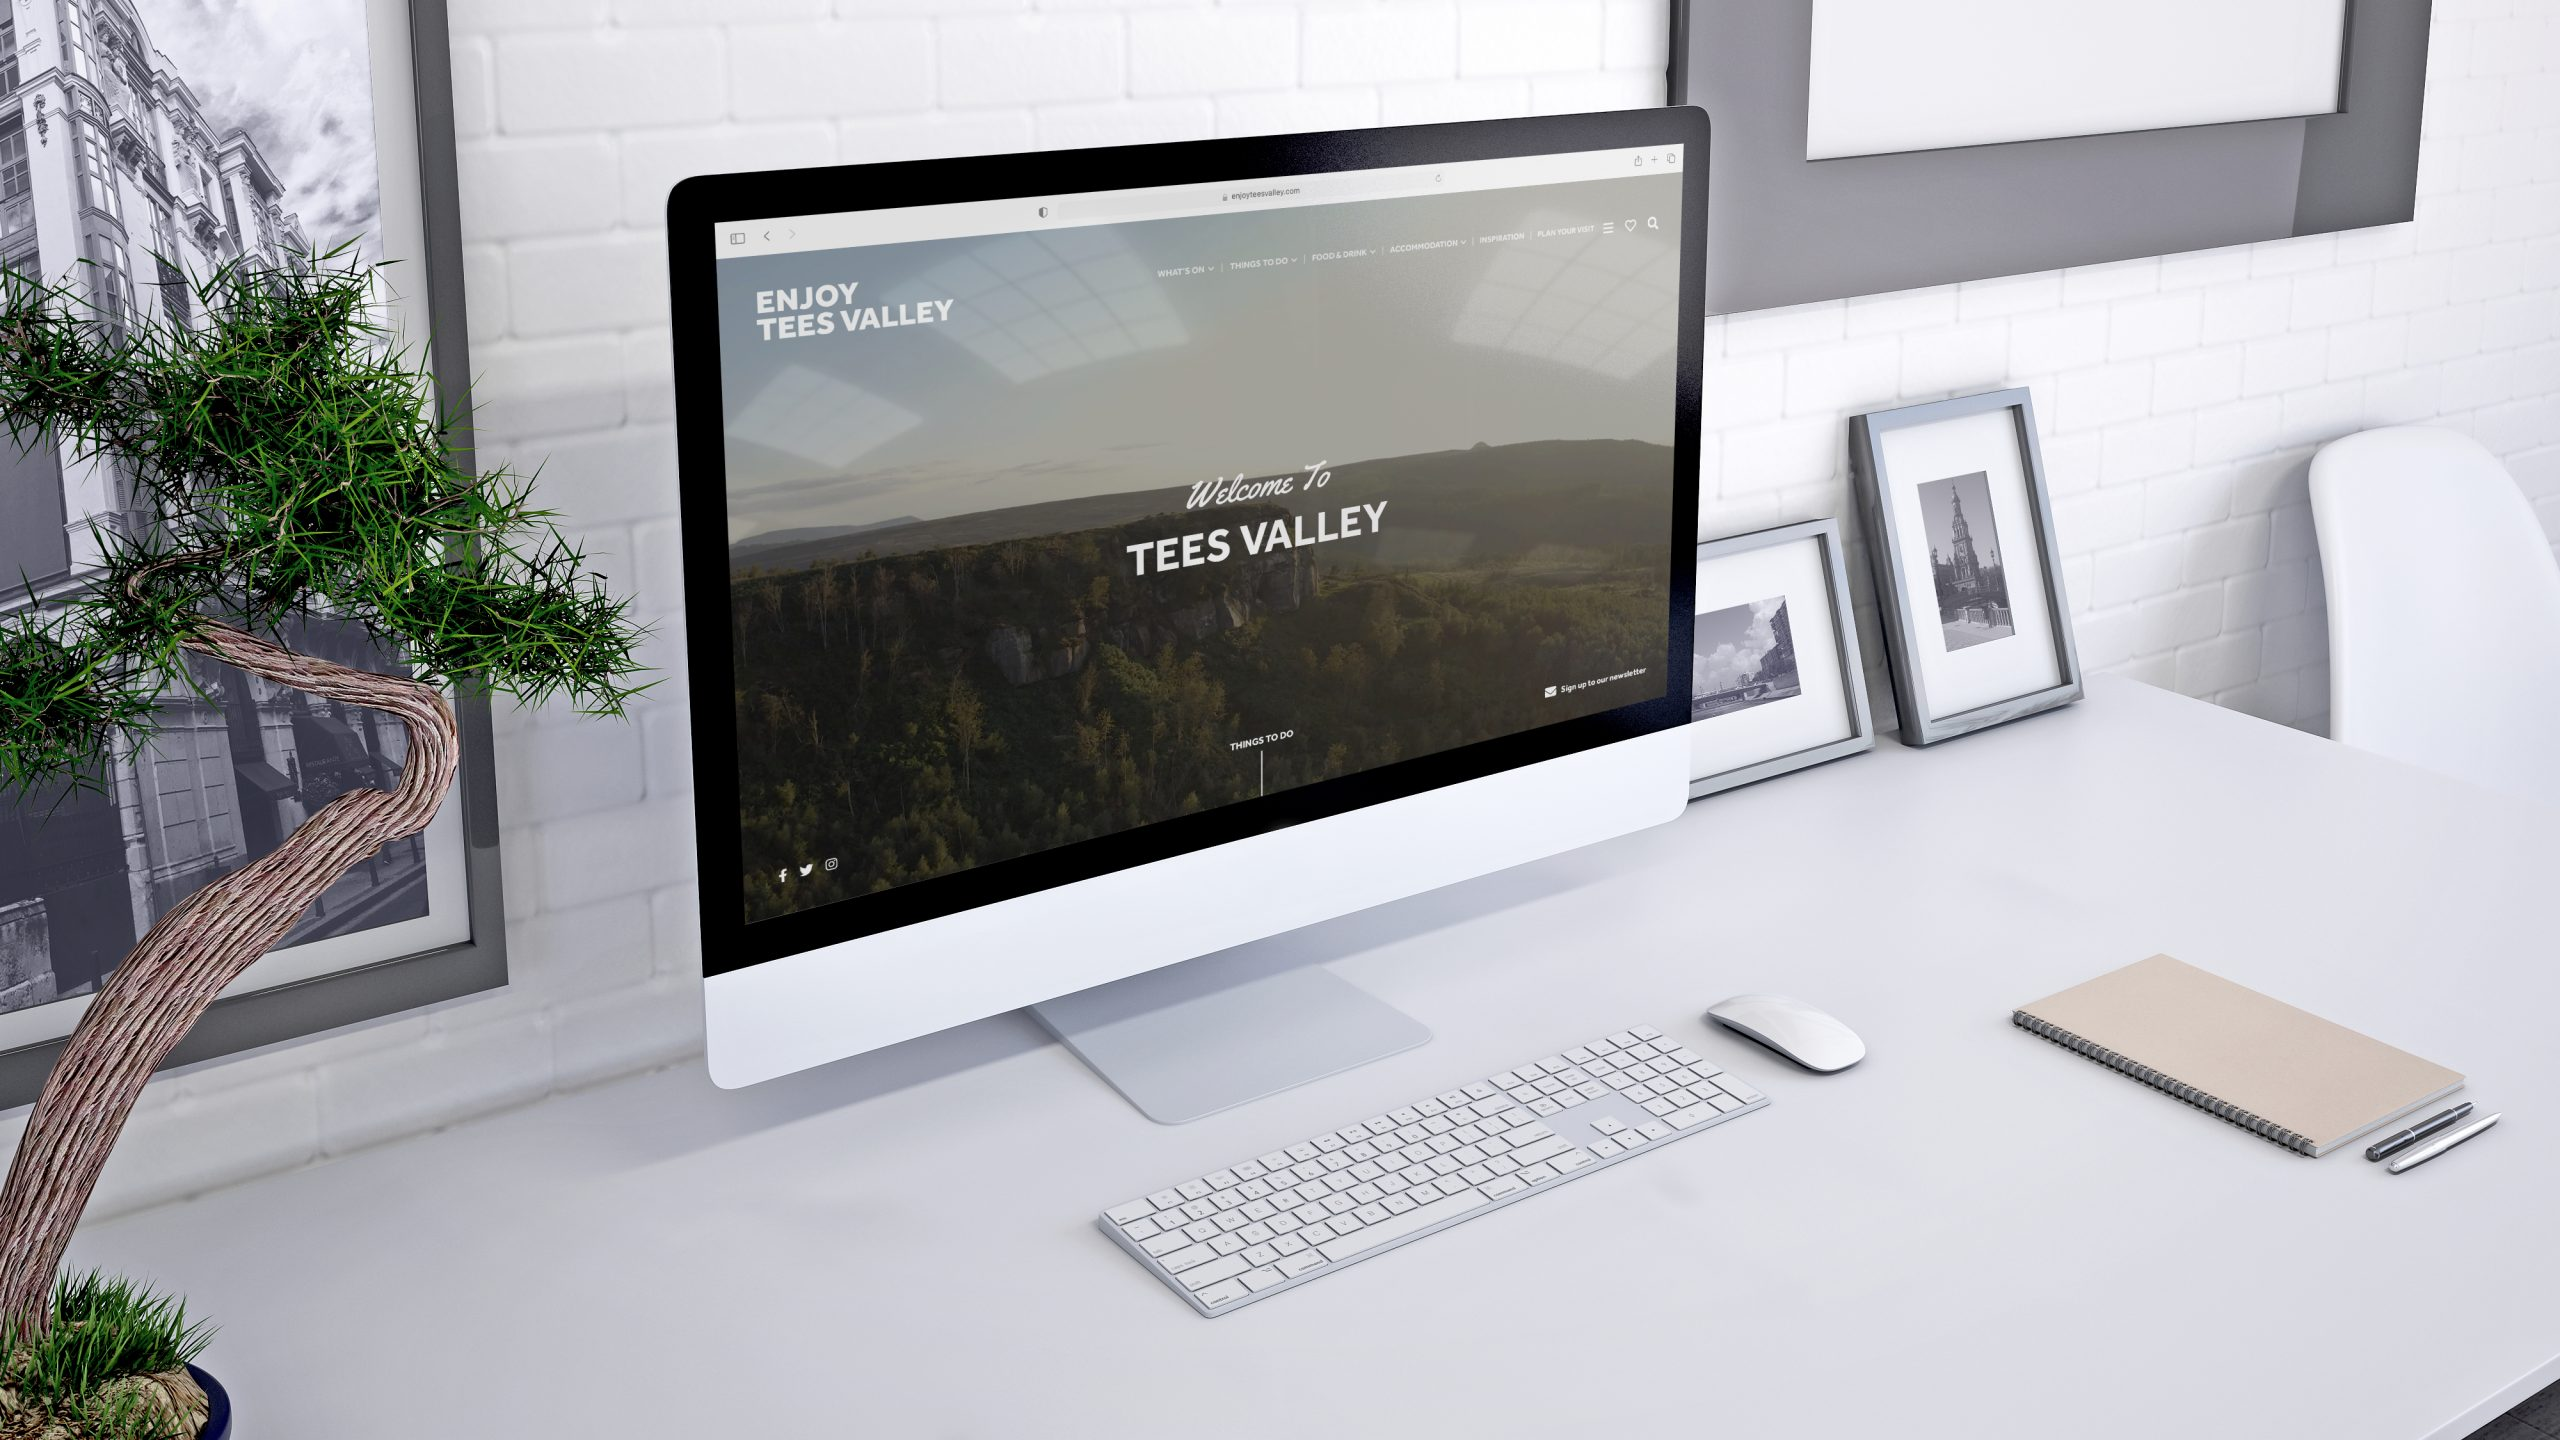 Enjoy Tees Valley